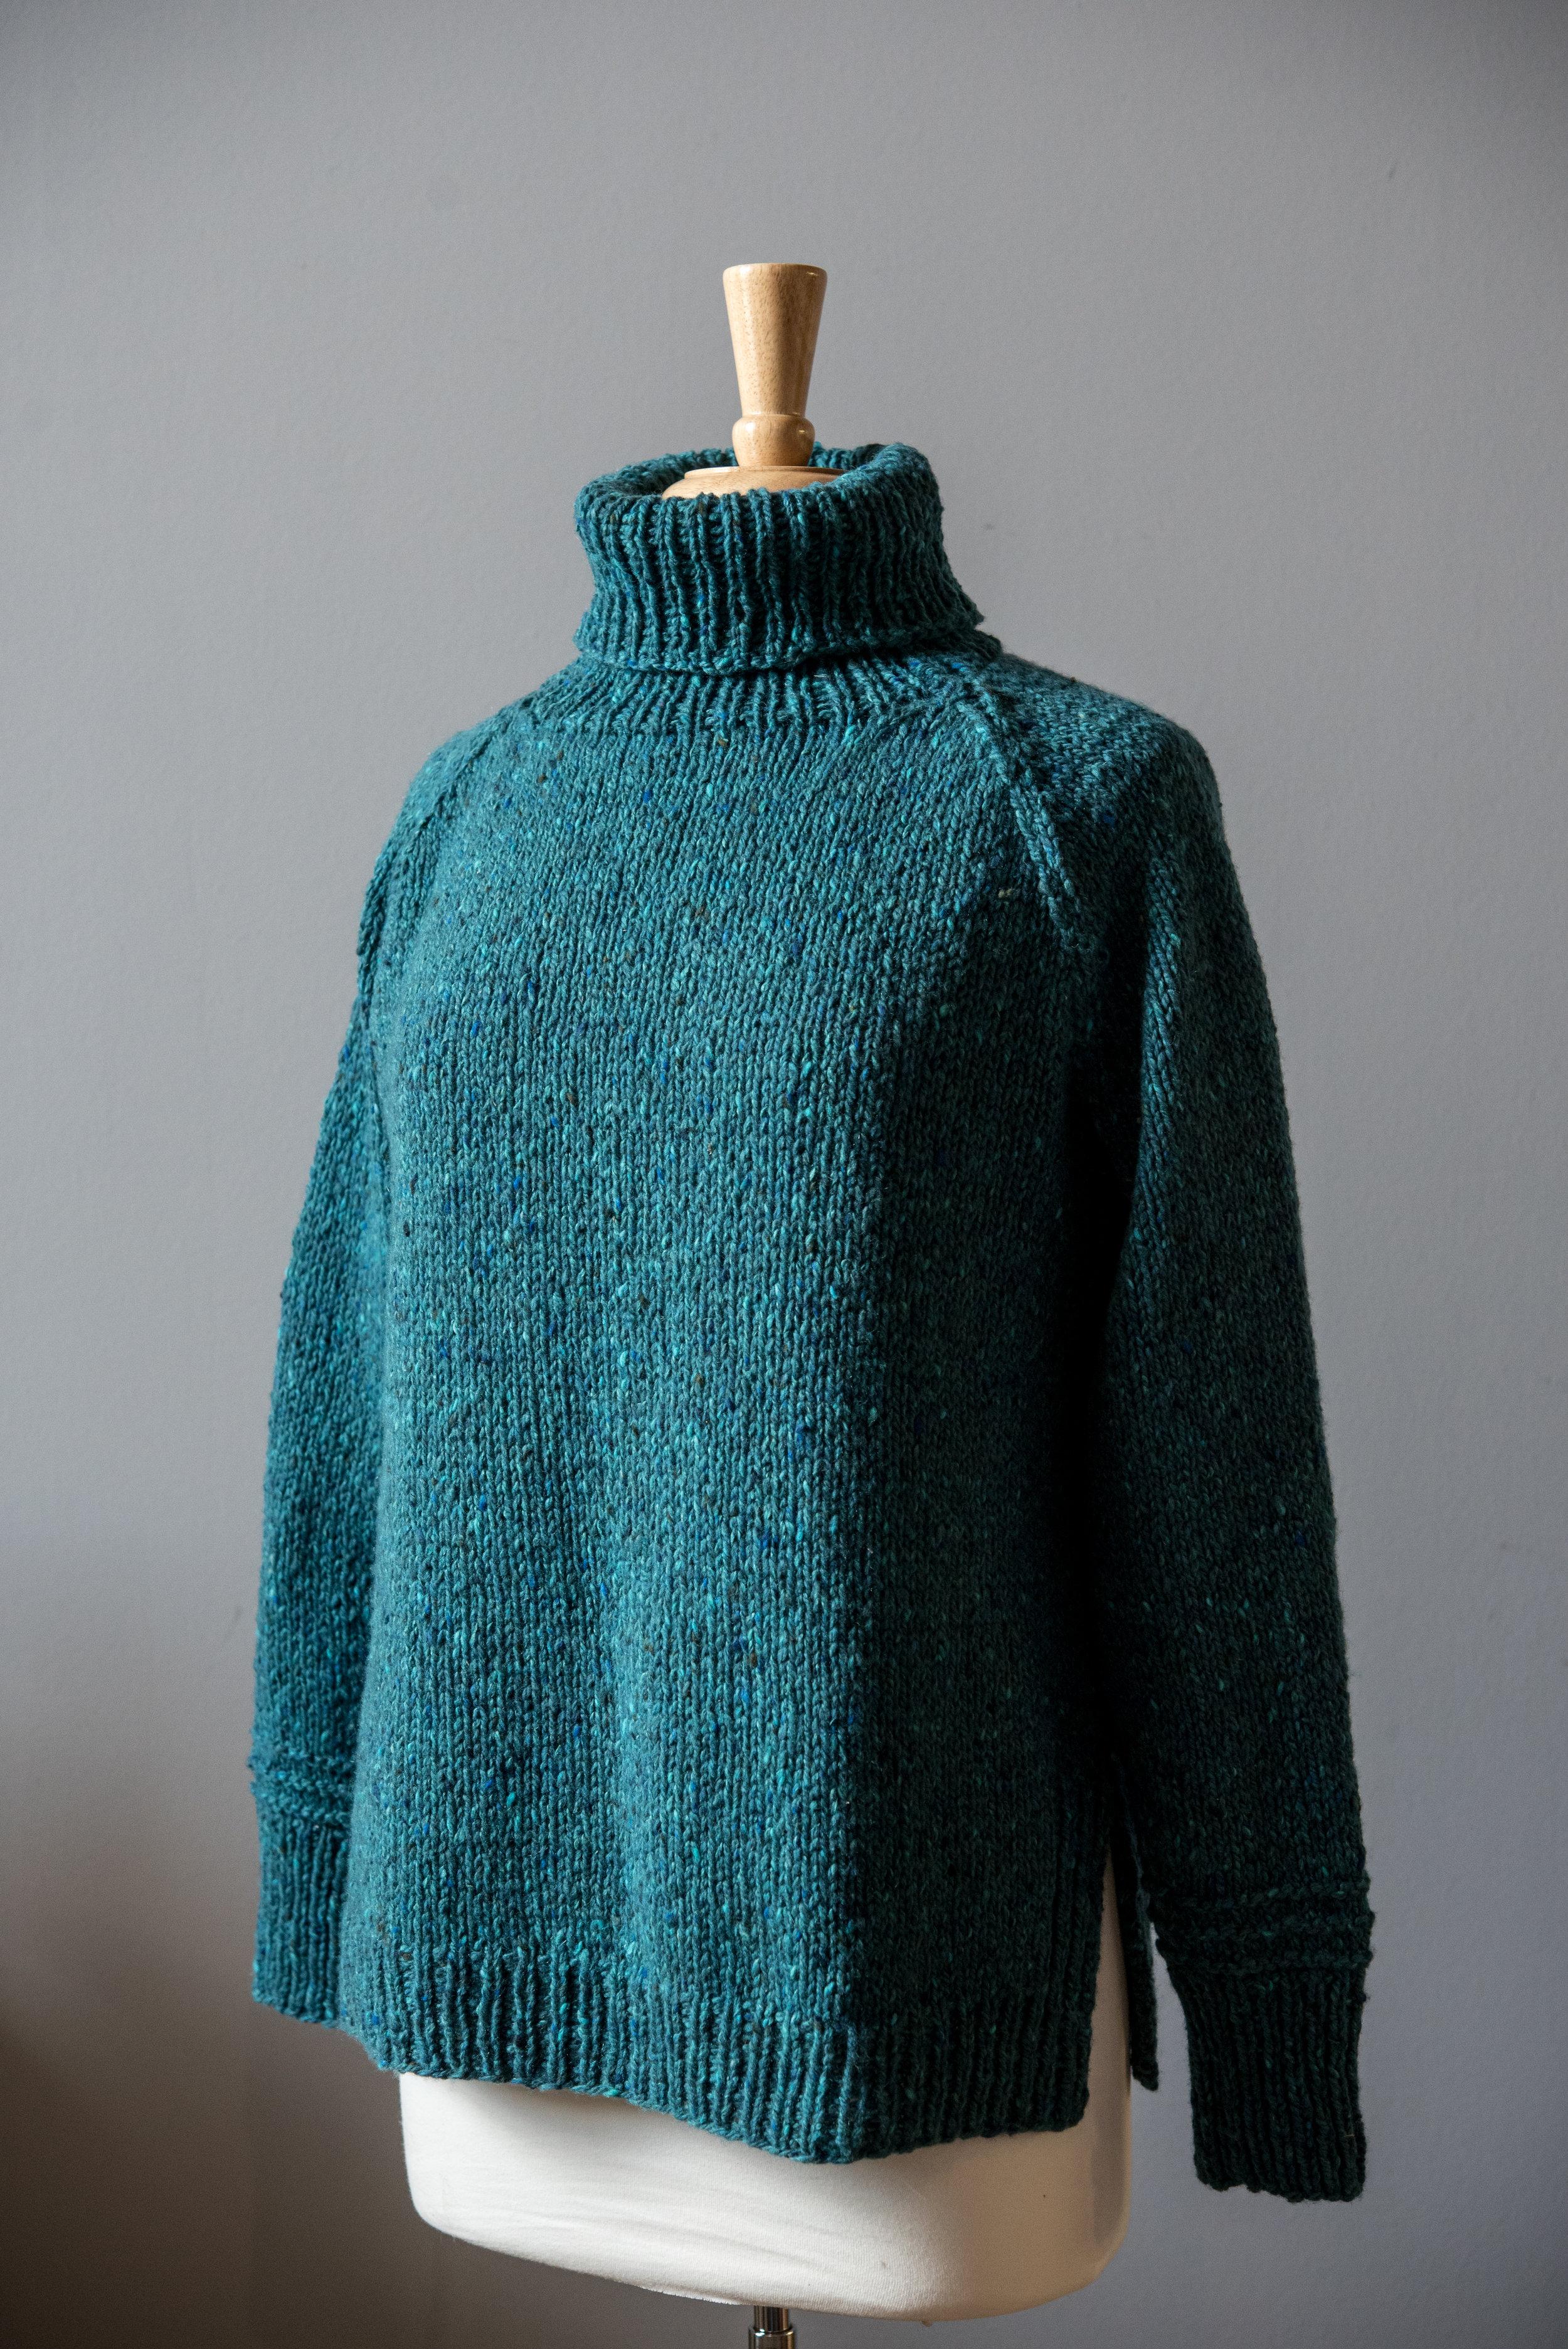 The Fibre Co Arranmore, Carrowkeel sweater